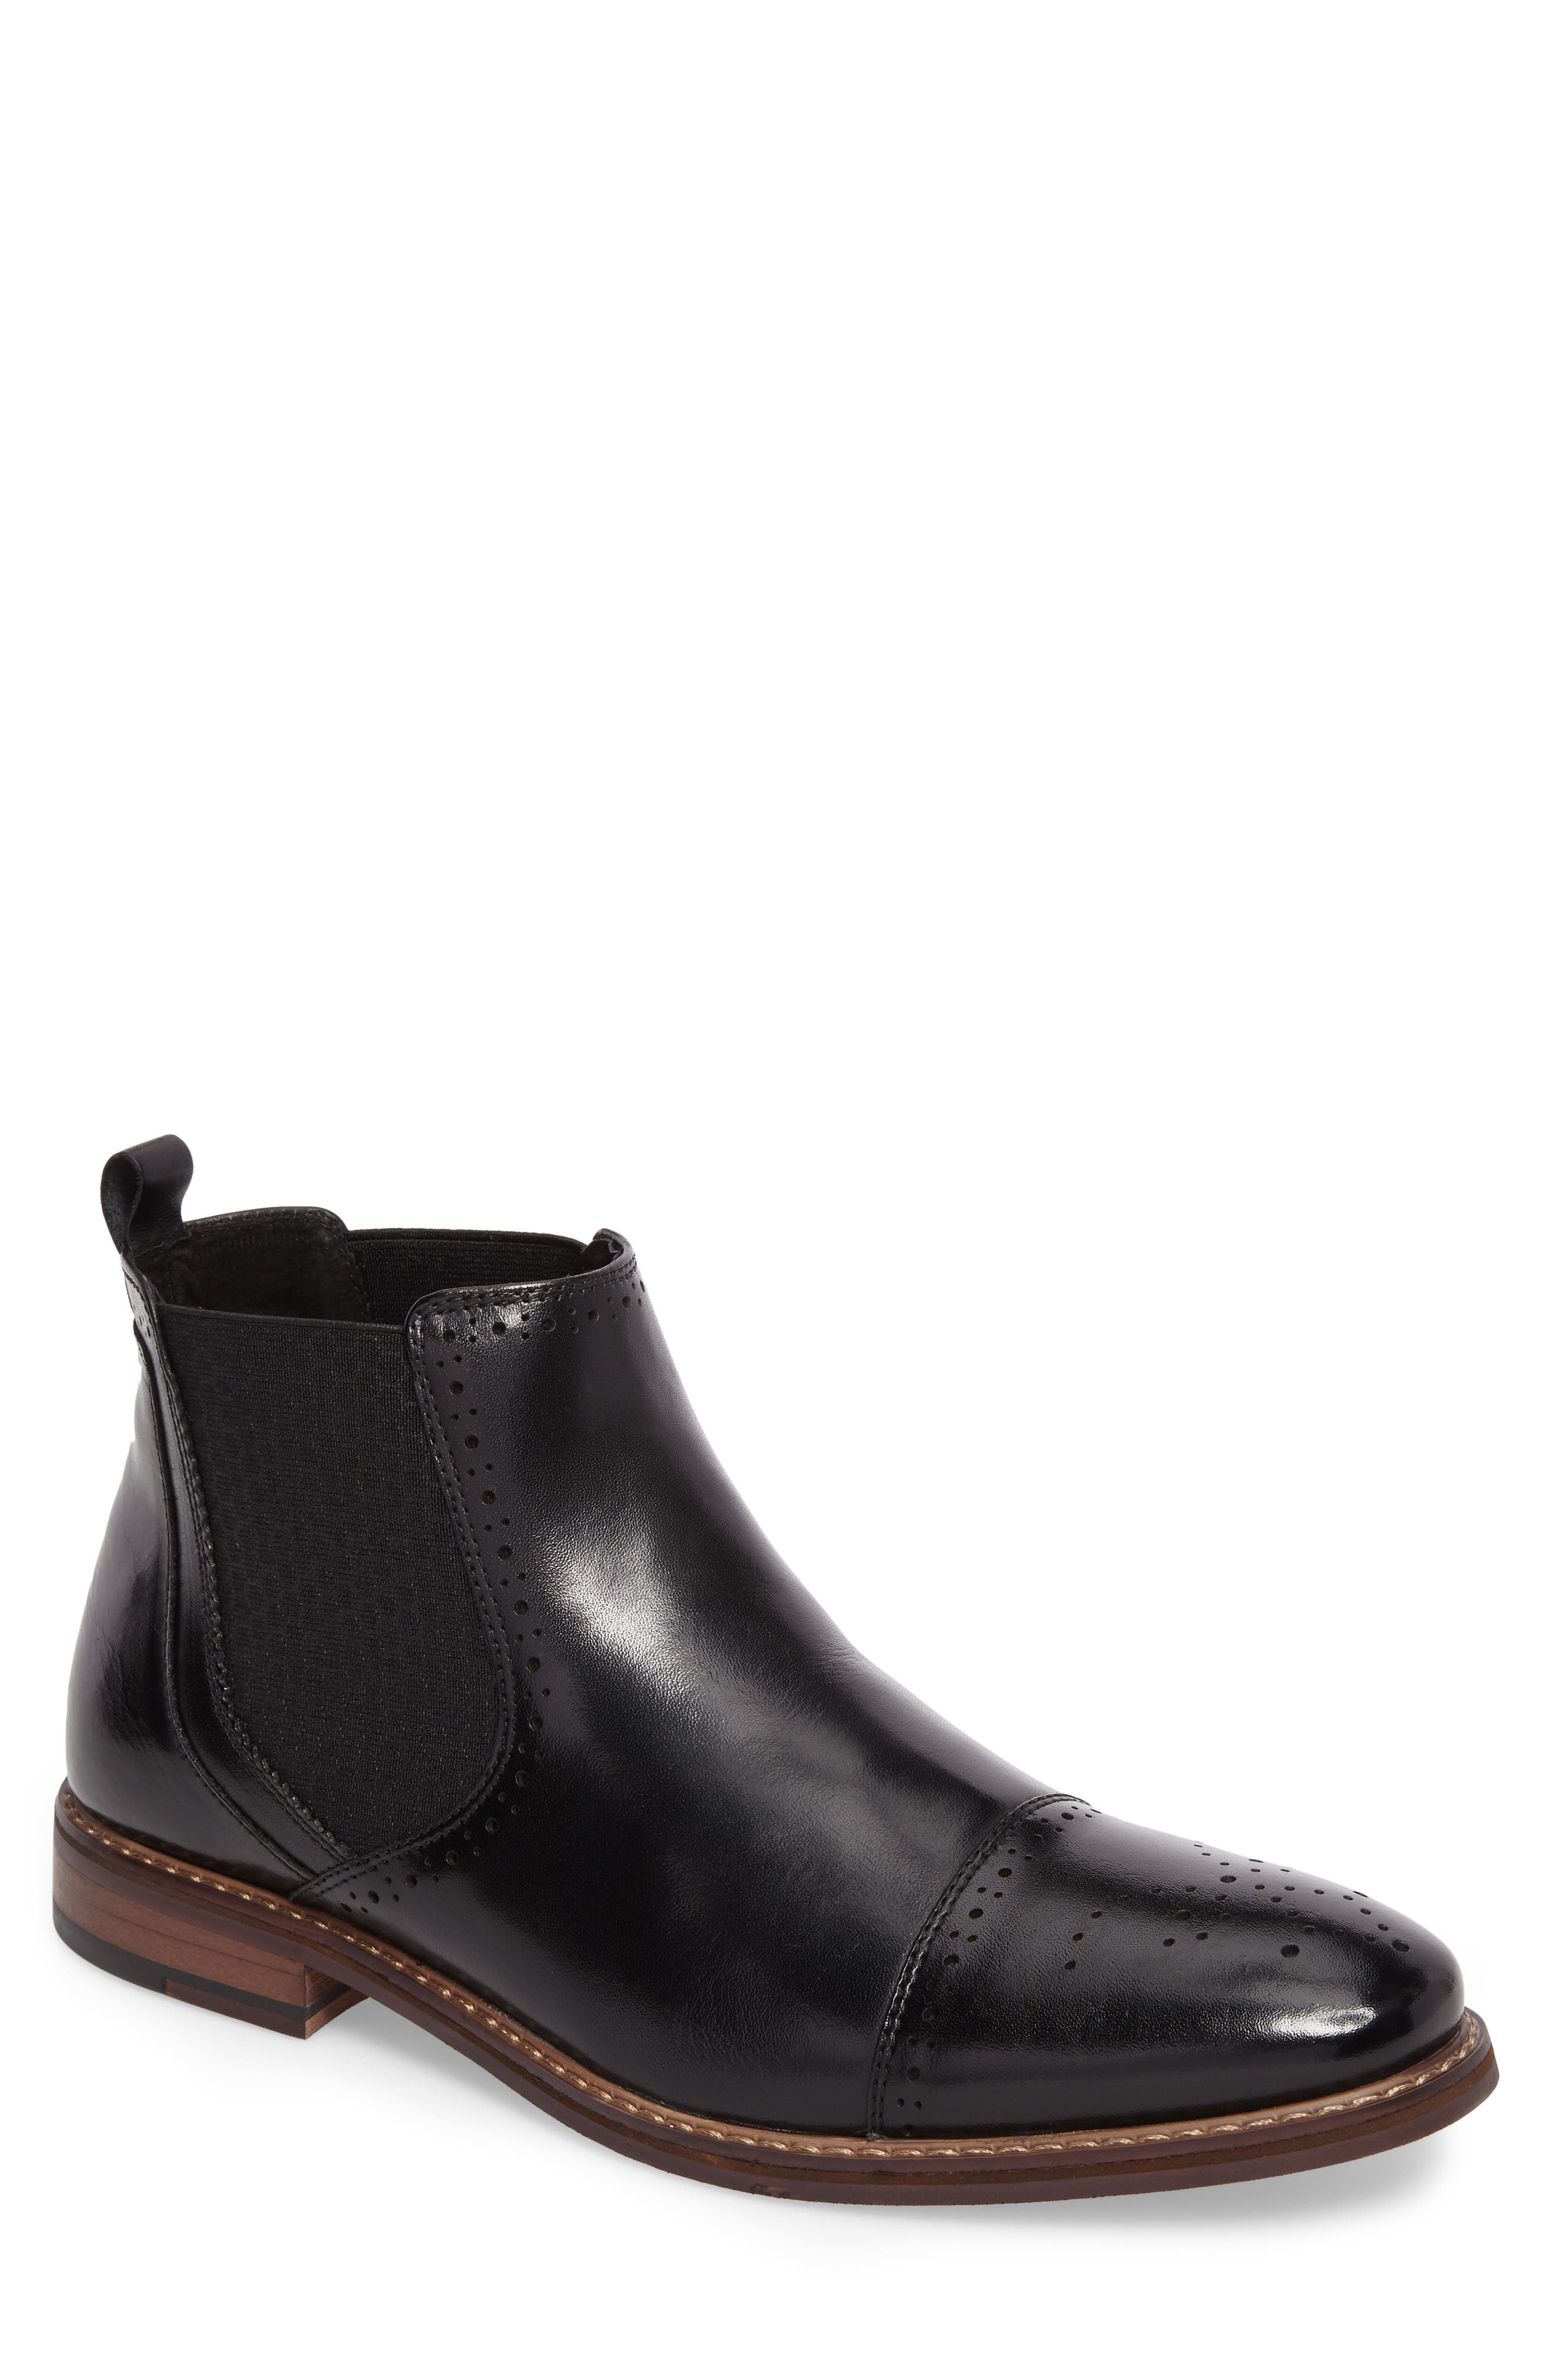 STACY ADAMS Alomar Chelsea Boot, Main, color, 001